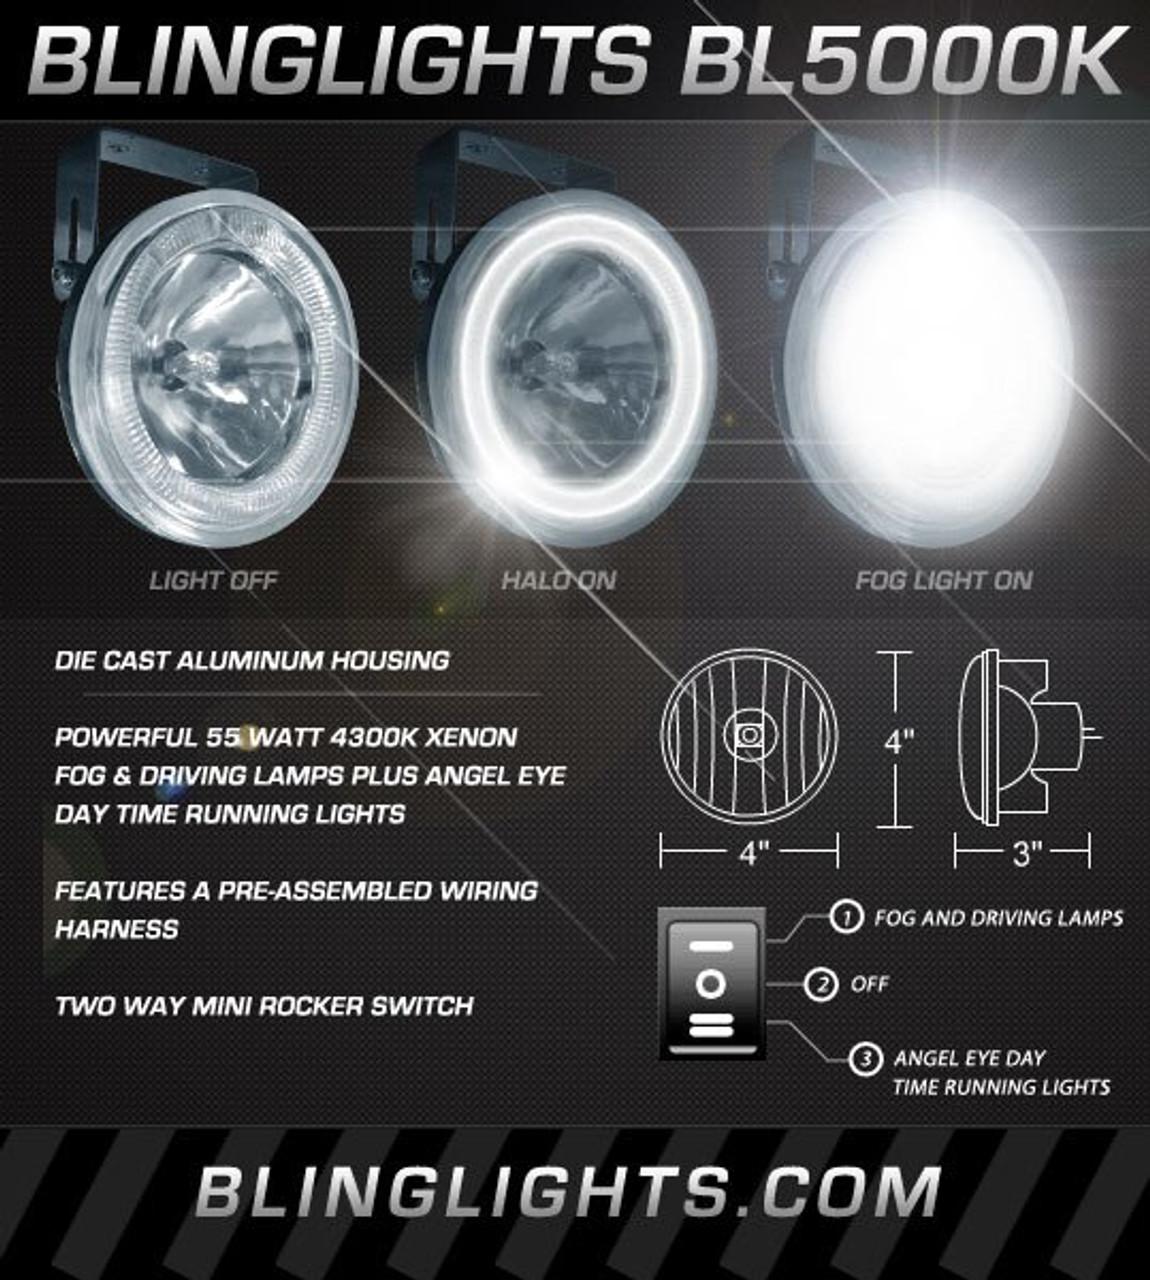 2002 2003 2004 Nissan Xterra Halo Angel Eye Fog Lamps Lights Kit  Xterra Fog Light Wiring Harness on